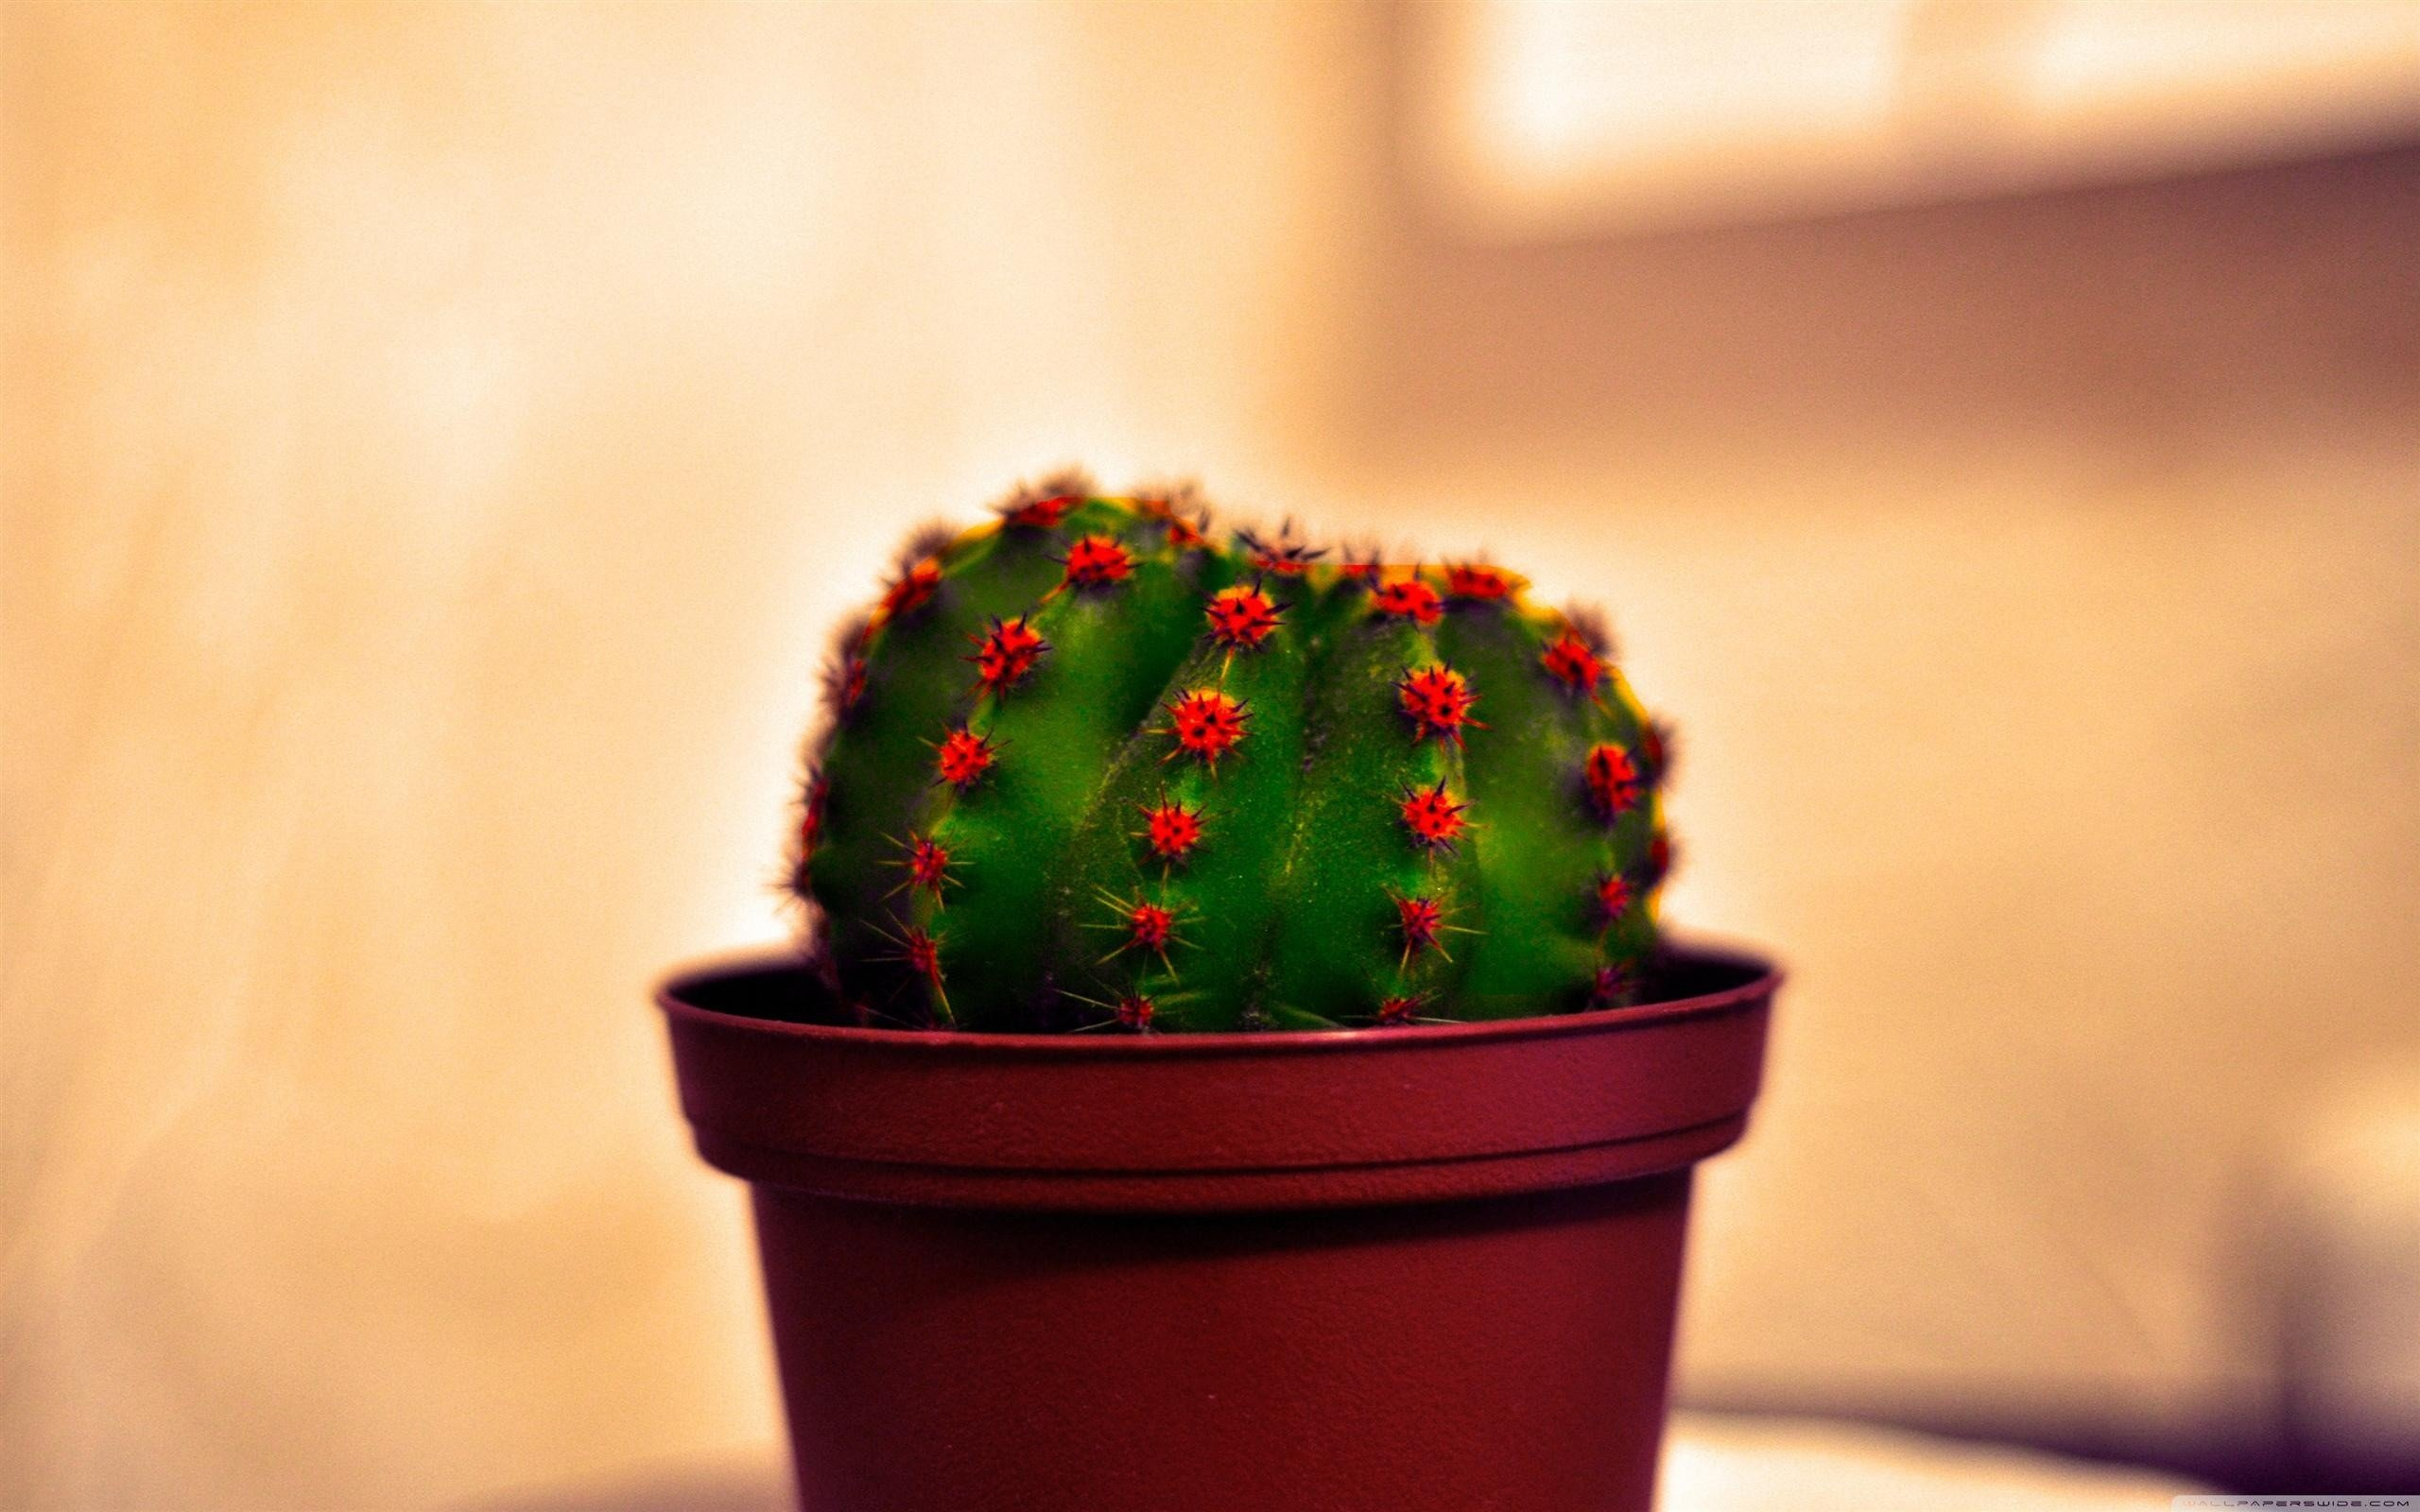 Cactus Wallpapers Hd For Desktop Backgrounds